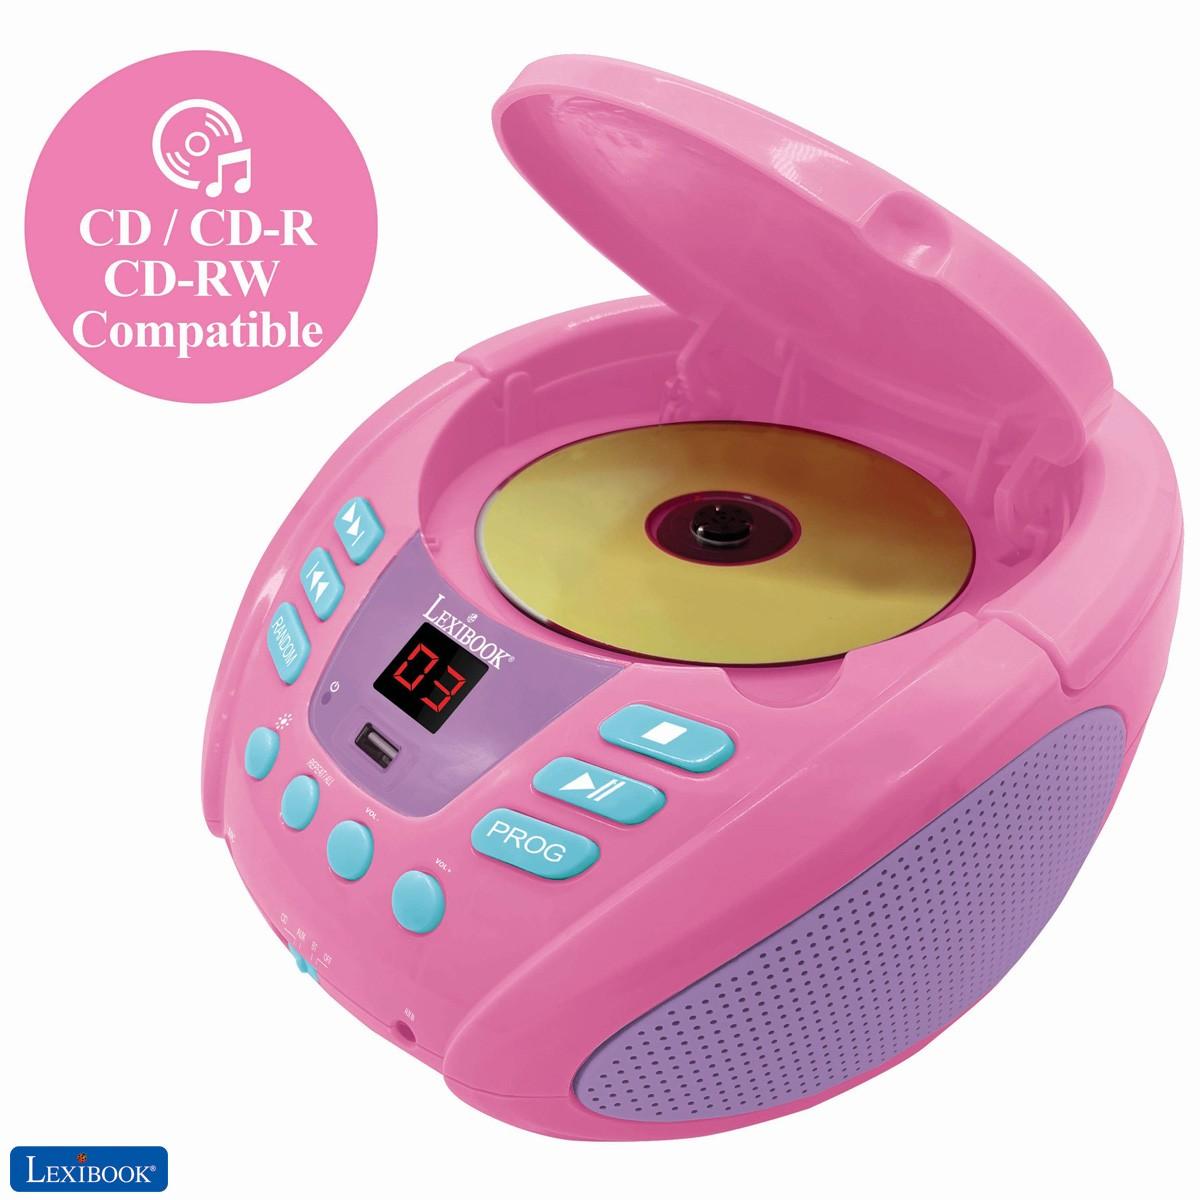 Unicorn - Bluetooth CD player for kids